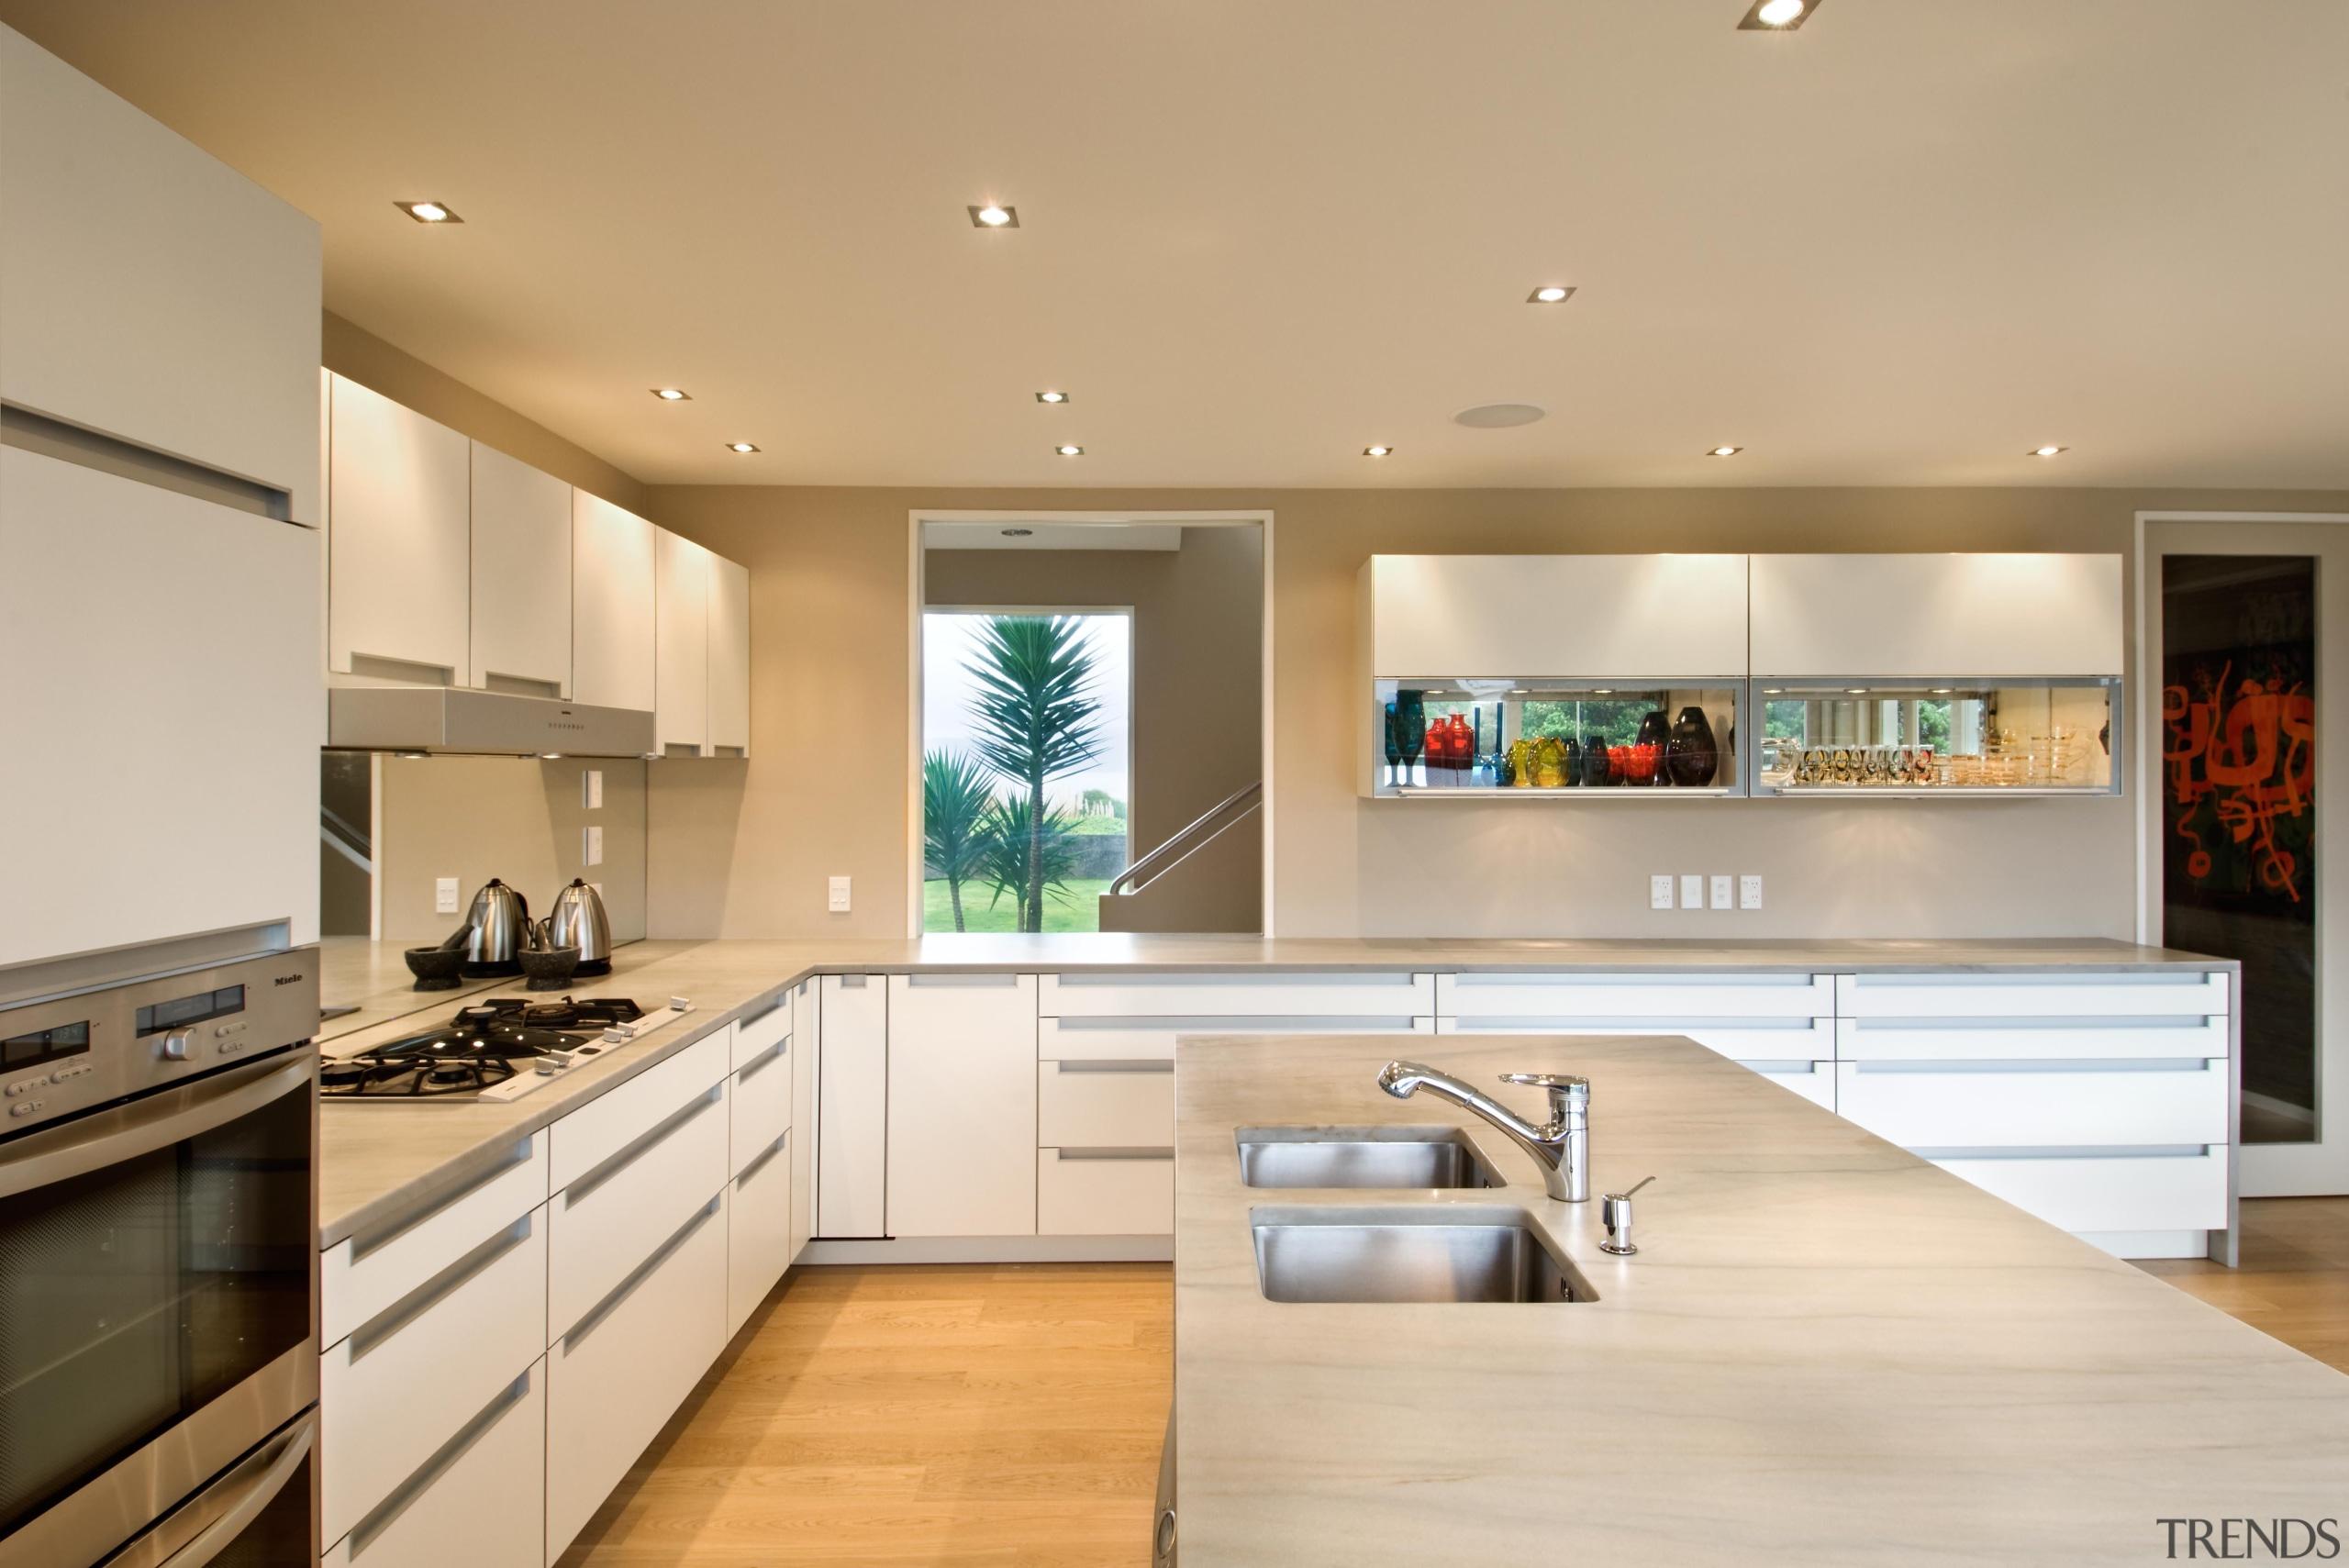 Paraparaumu Kitchen - Paraparaumu Kitchen - cabinetry | cabinetry, countertop, cuisine classique, interior design, kitchen, real estate, room, orange